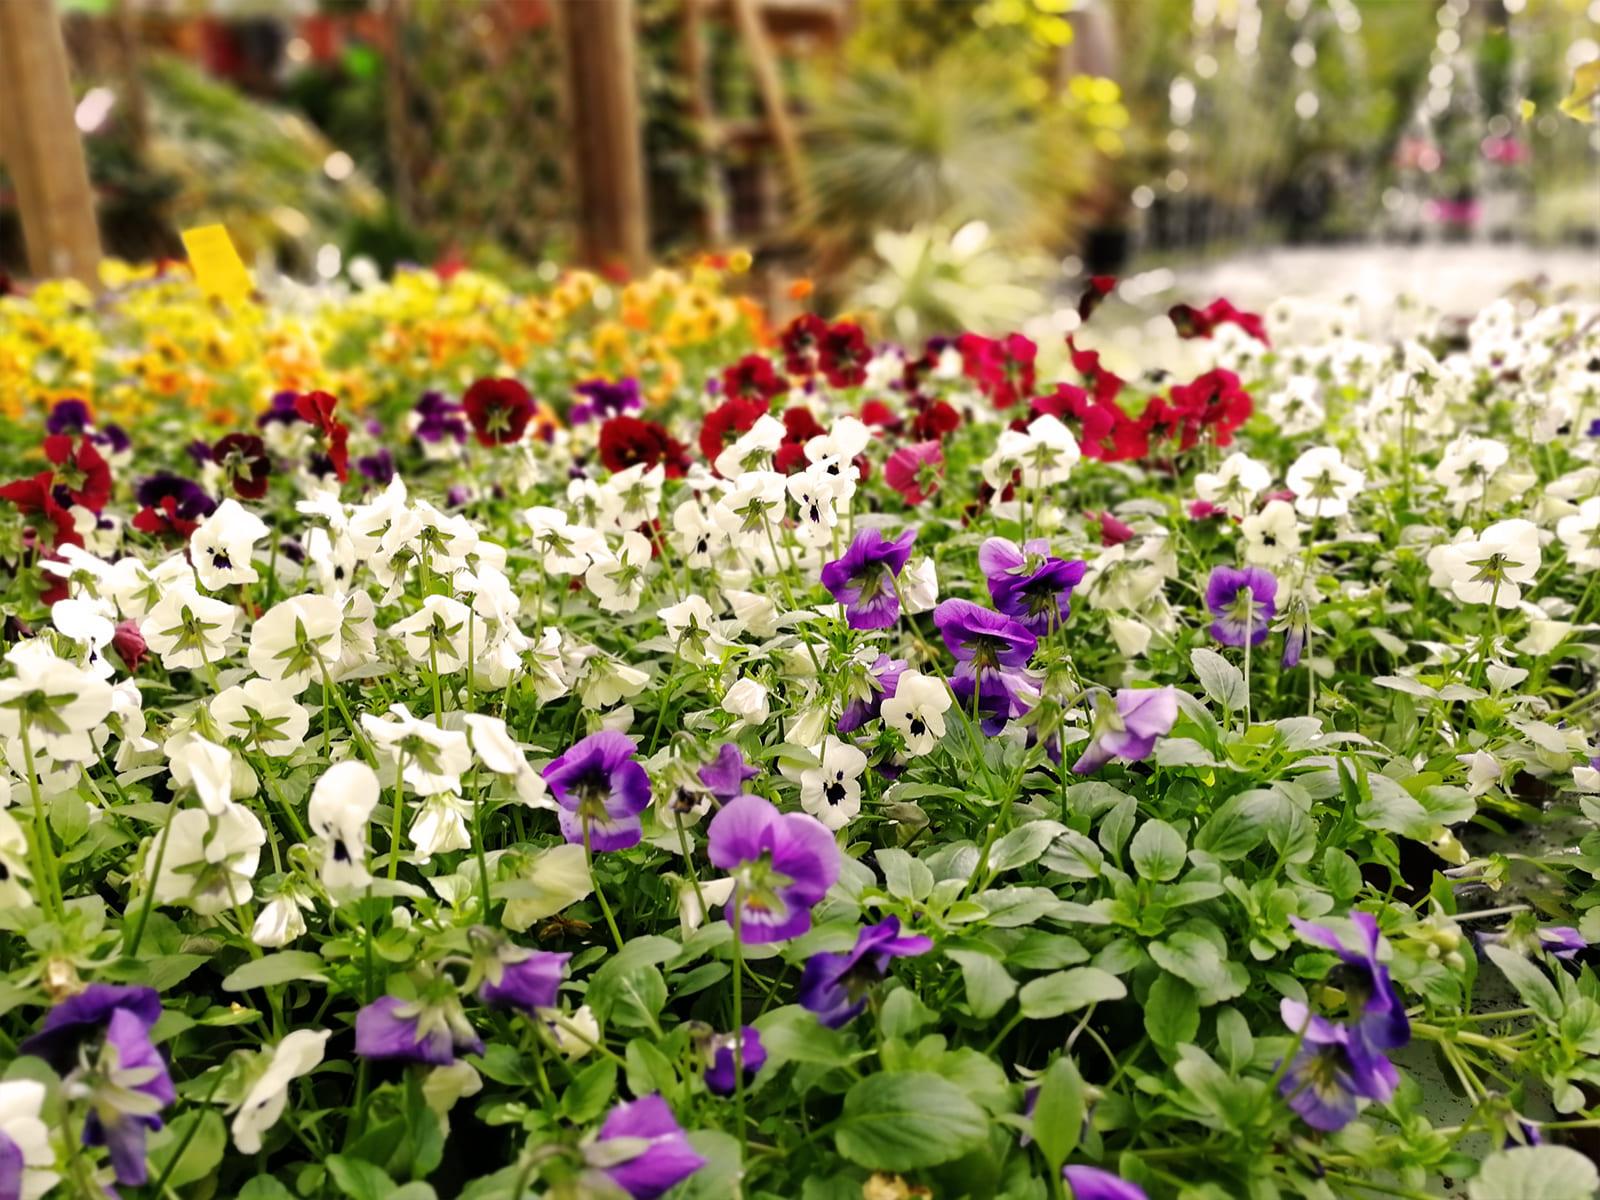 centro-jardineria-garden-invernadero-artesanal-madera-fuente-18_HIDROJARDIN-Bañeres